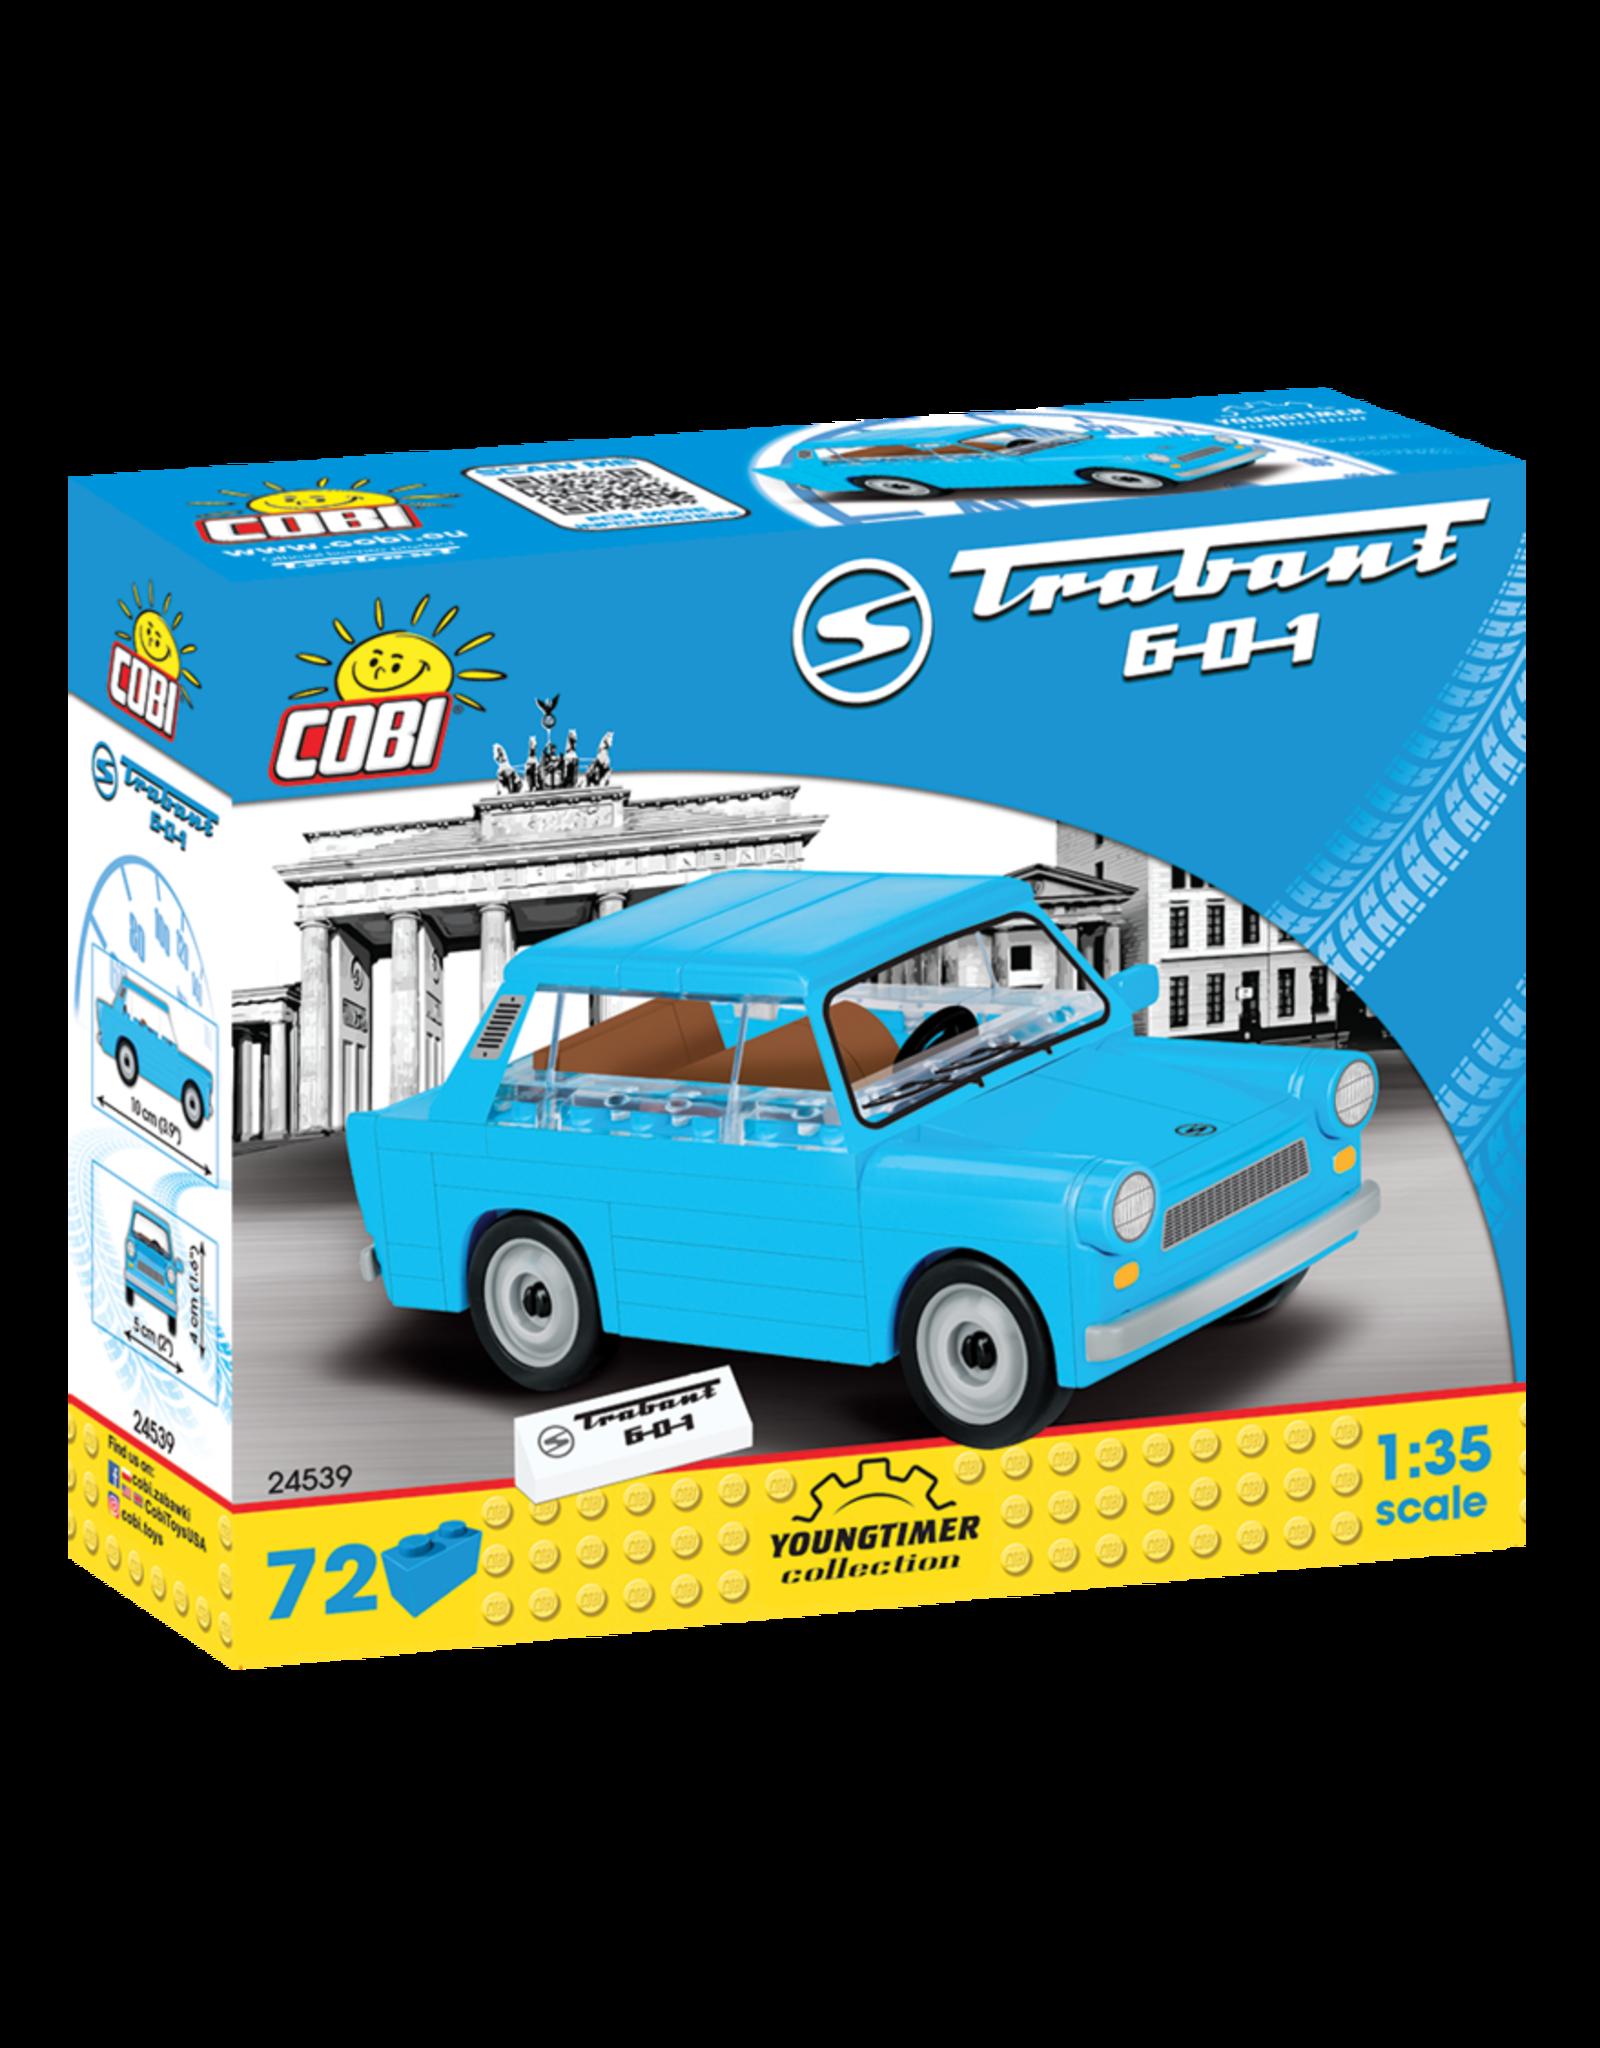 COBI COBI 24539 - Trabant 601